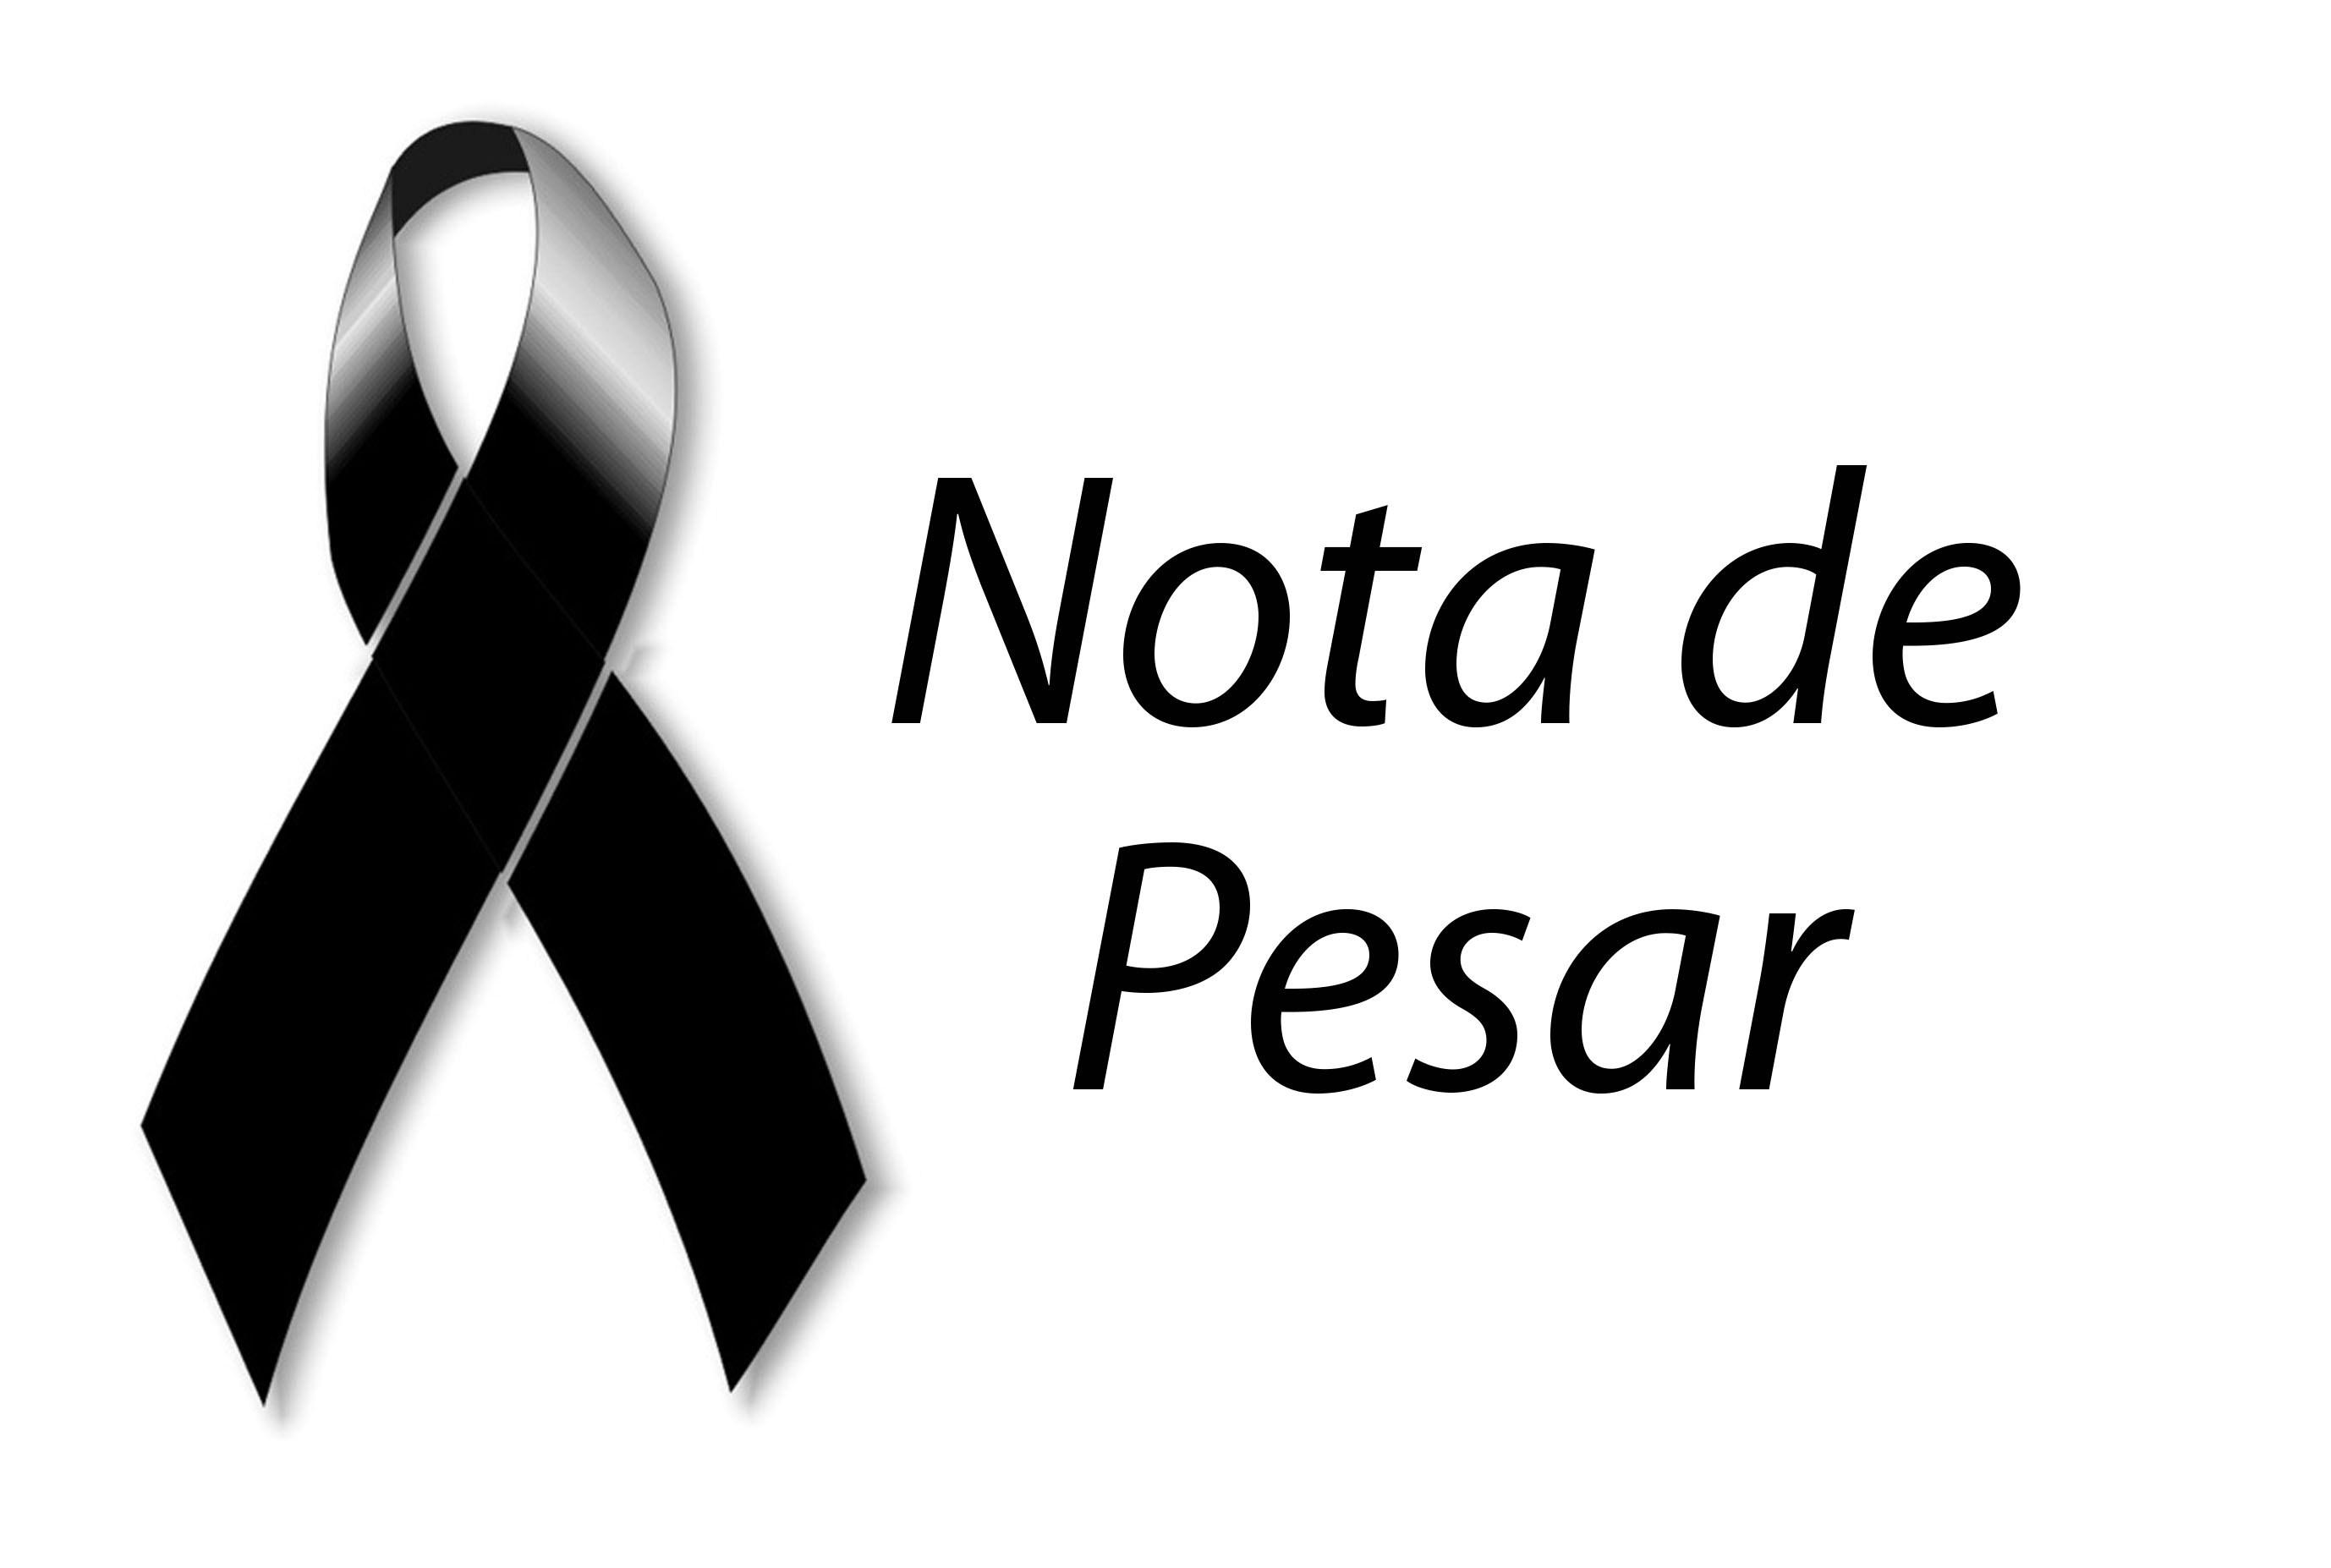 Notadepesar-1